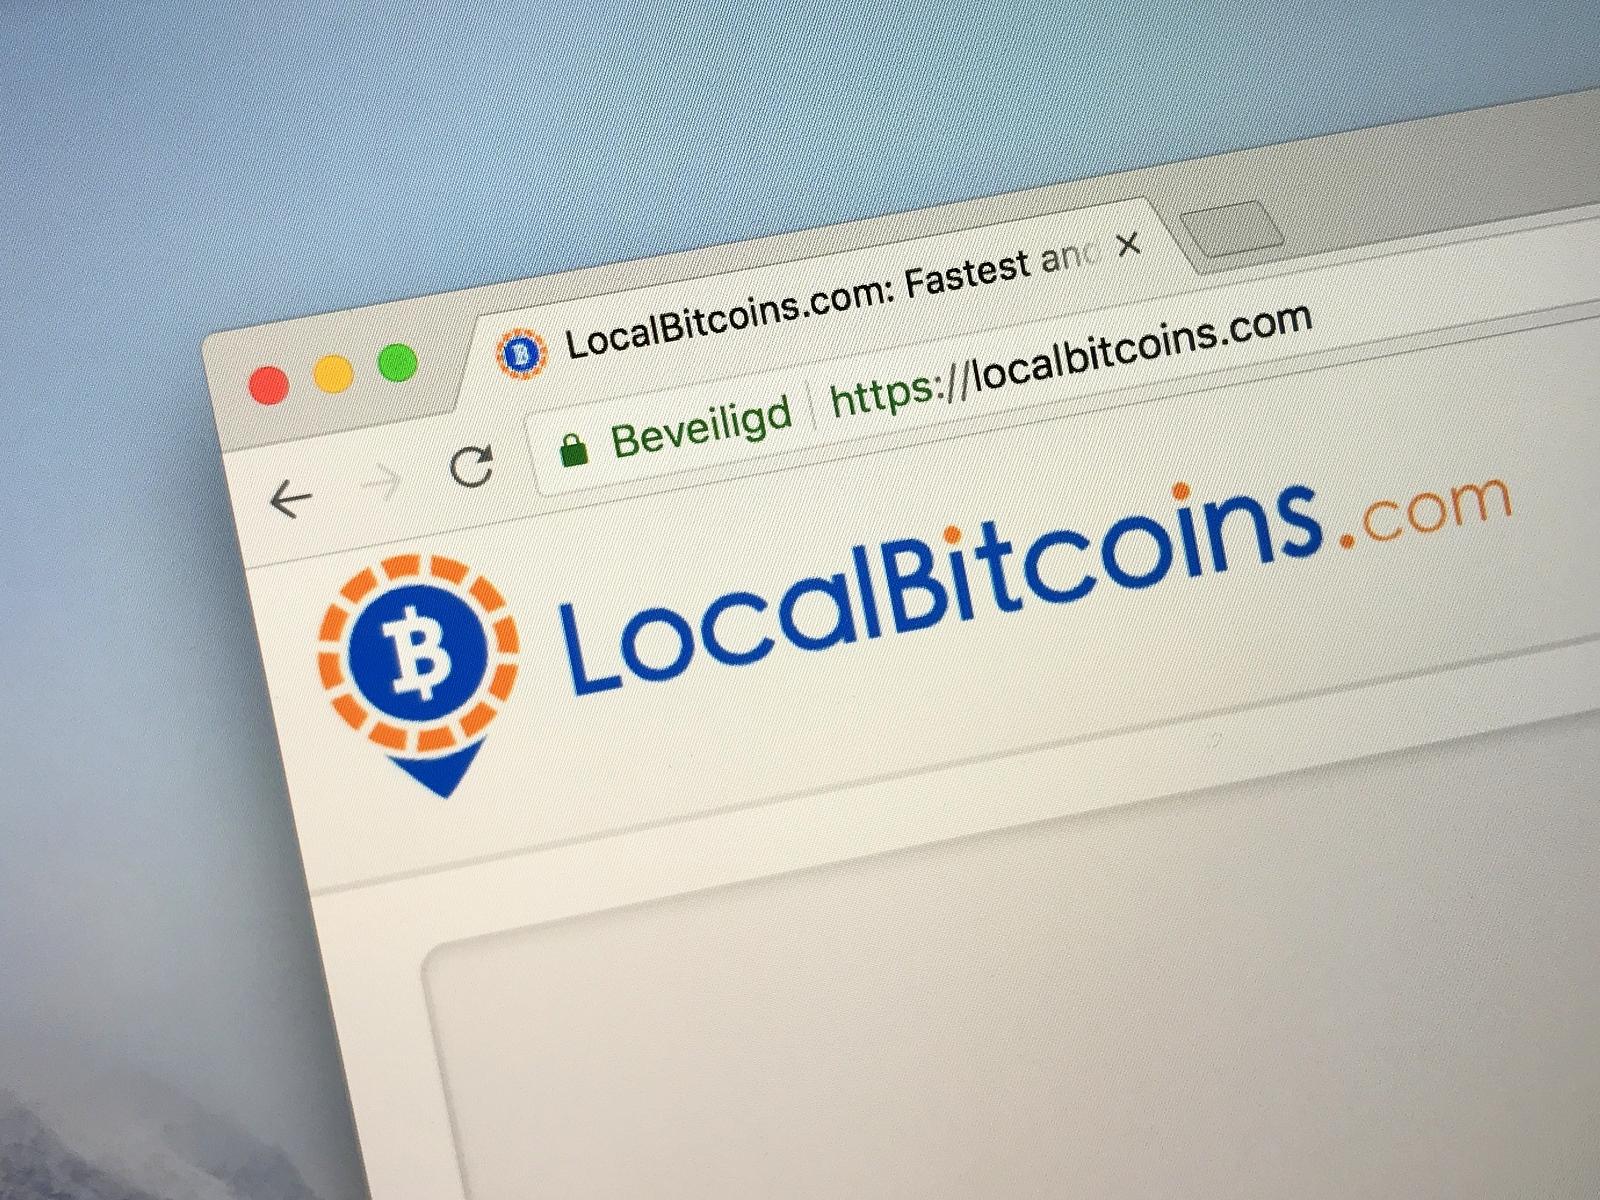 LocalBitcoins to Reduce Anonymity as Part of Regulatory ...